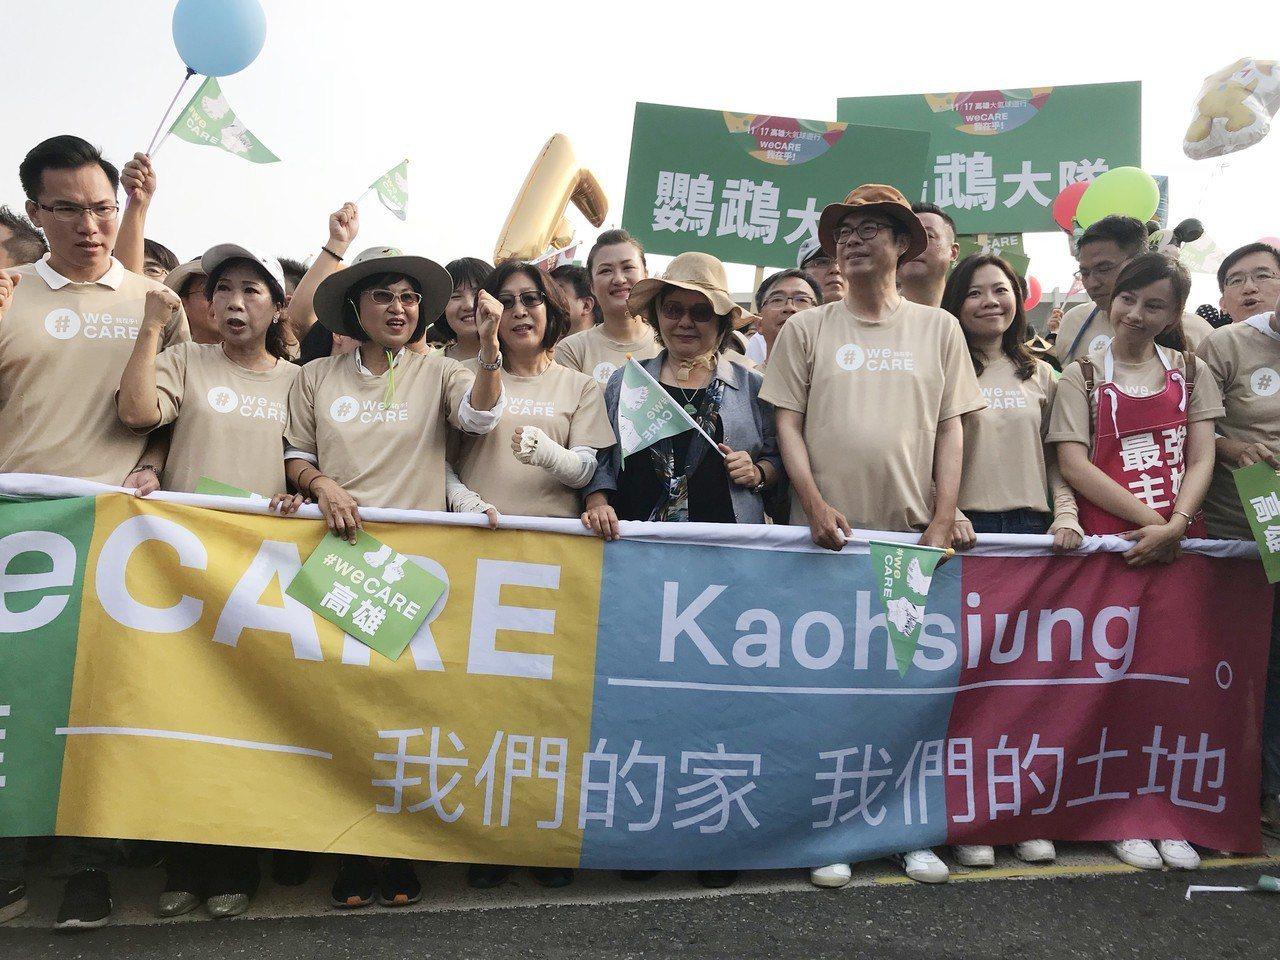 「#weCARE高雄大氣球遊行」17日下午正式登場,總統府秘書長陳菊(前右4)、...